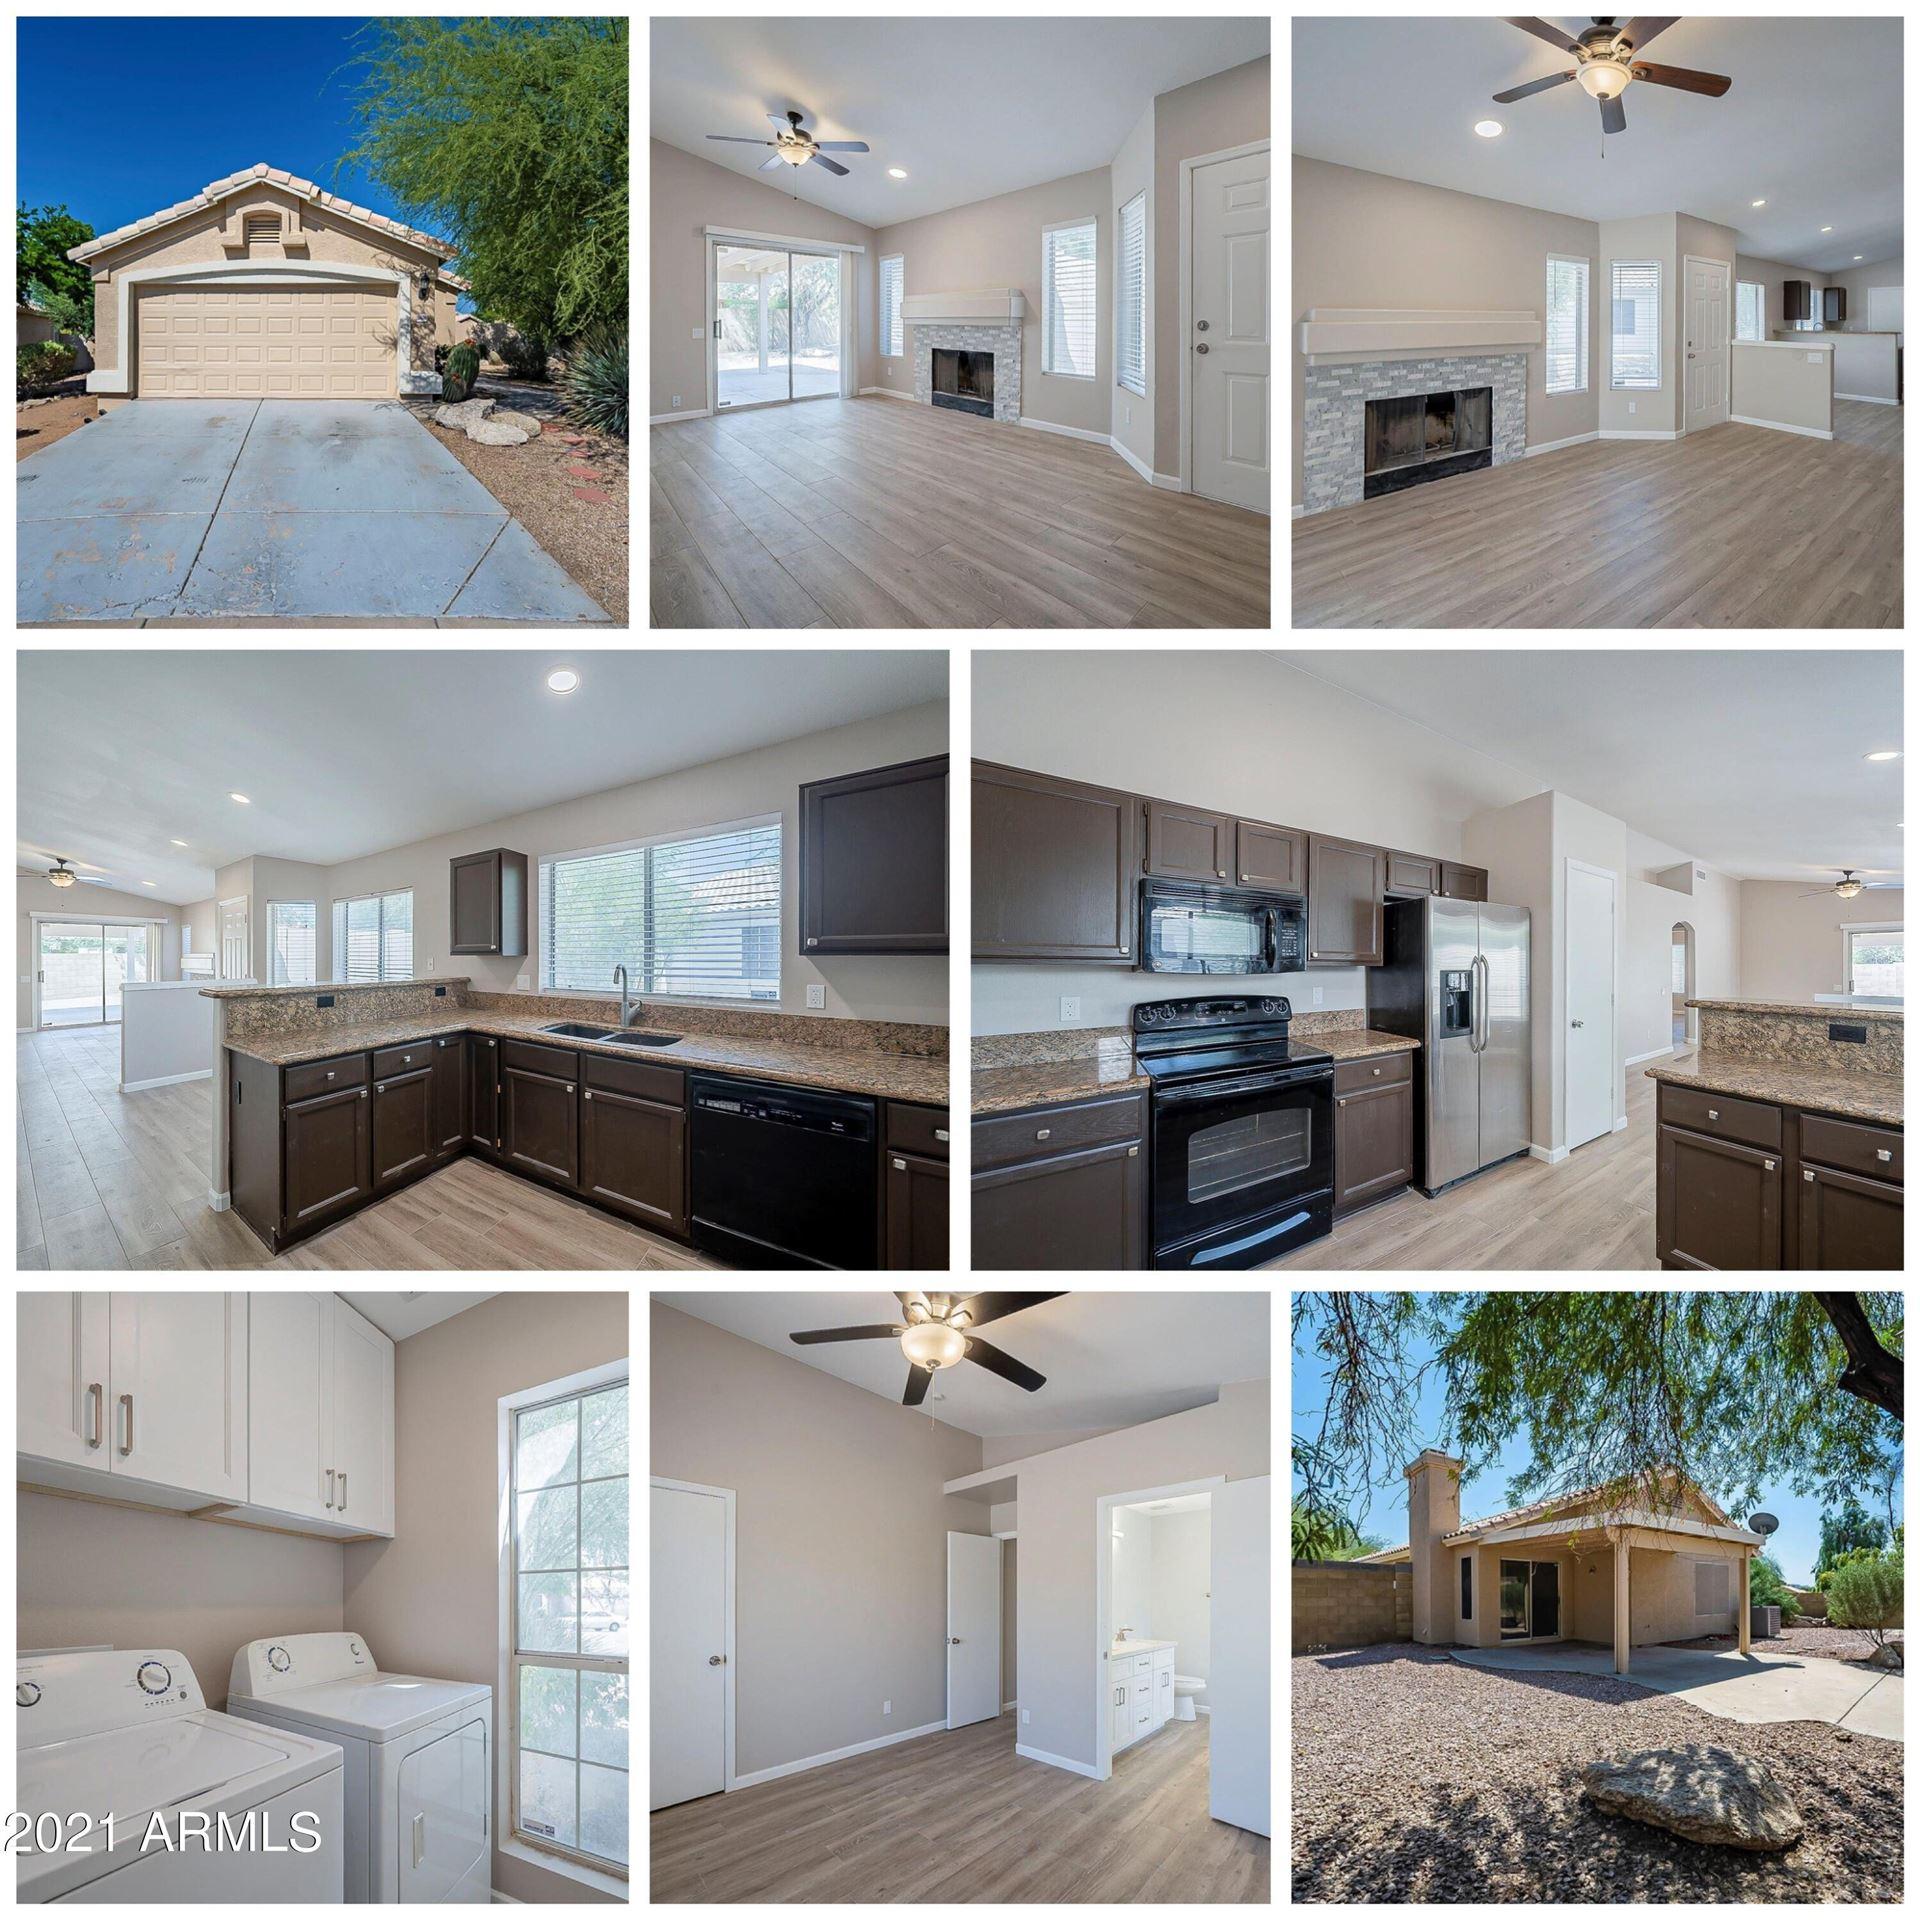 16636 N 35TH Place, Phoenix, AZ 85032 - MLS#: 6293031